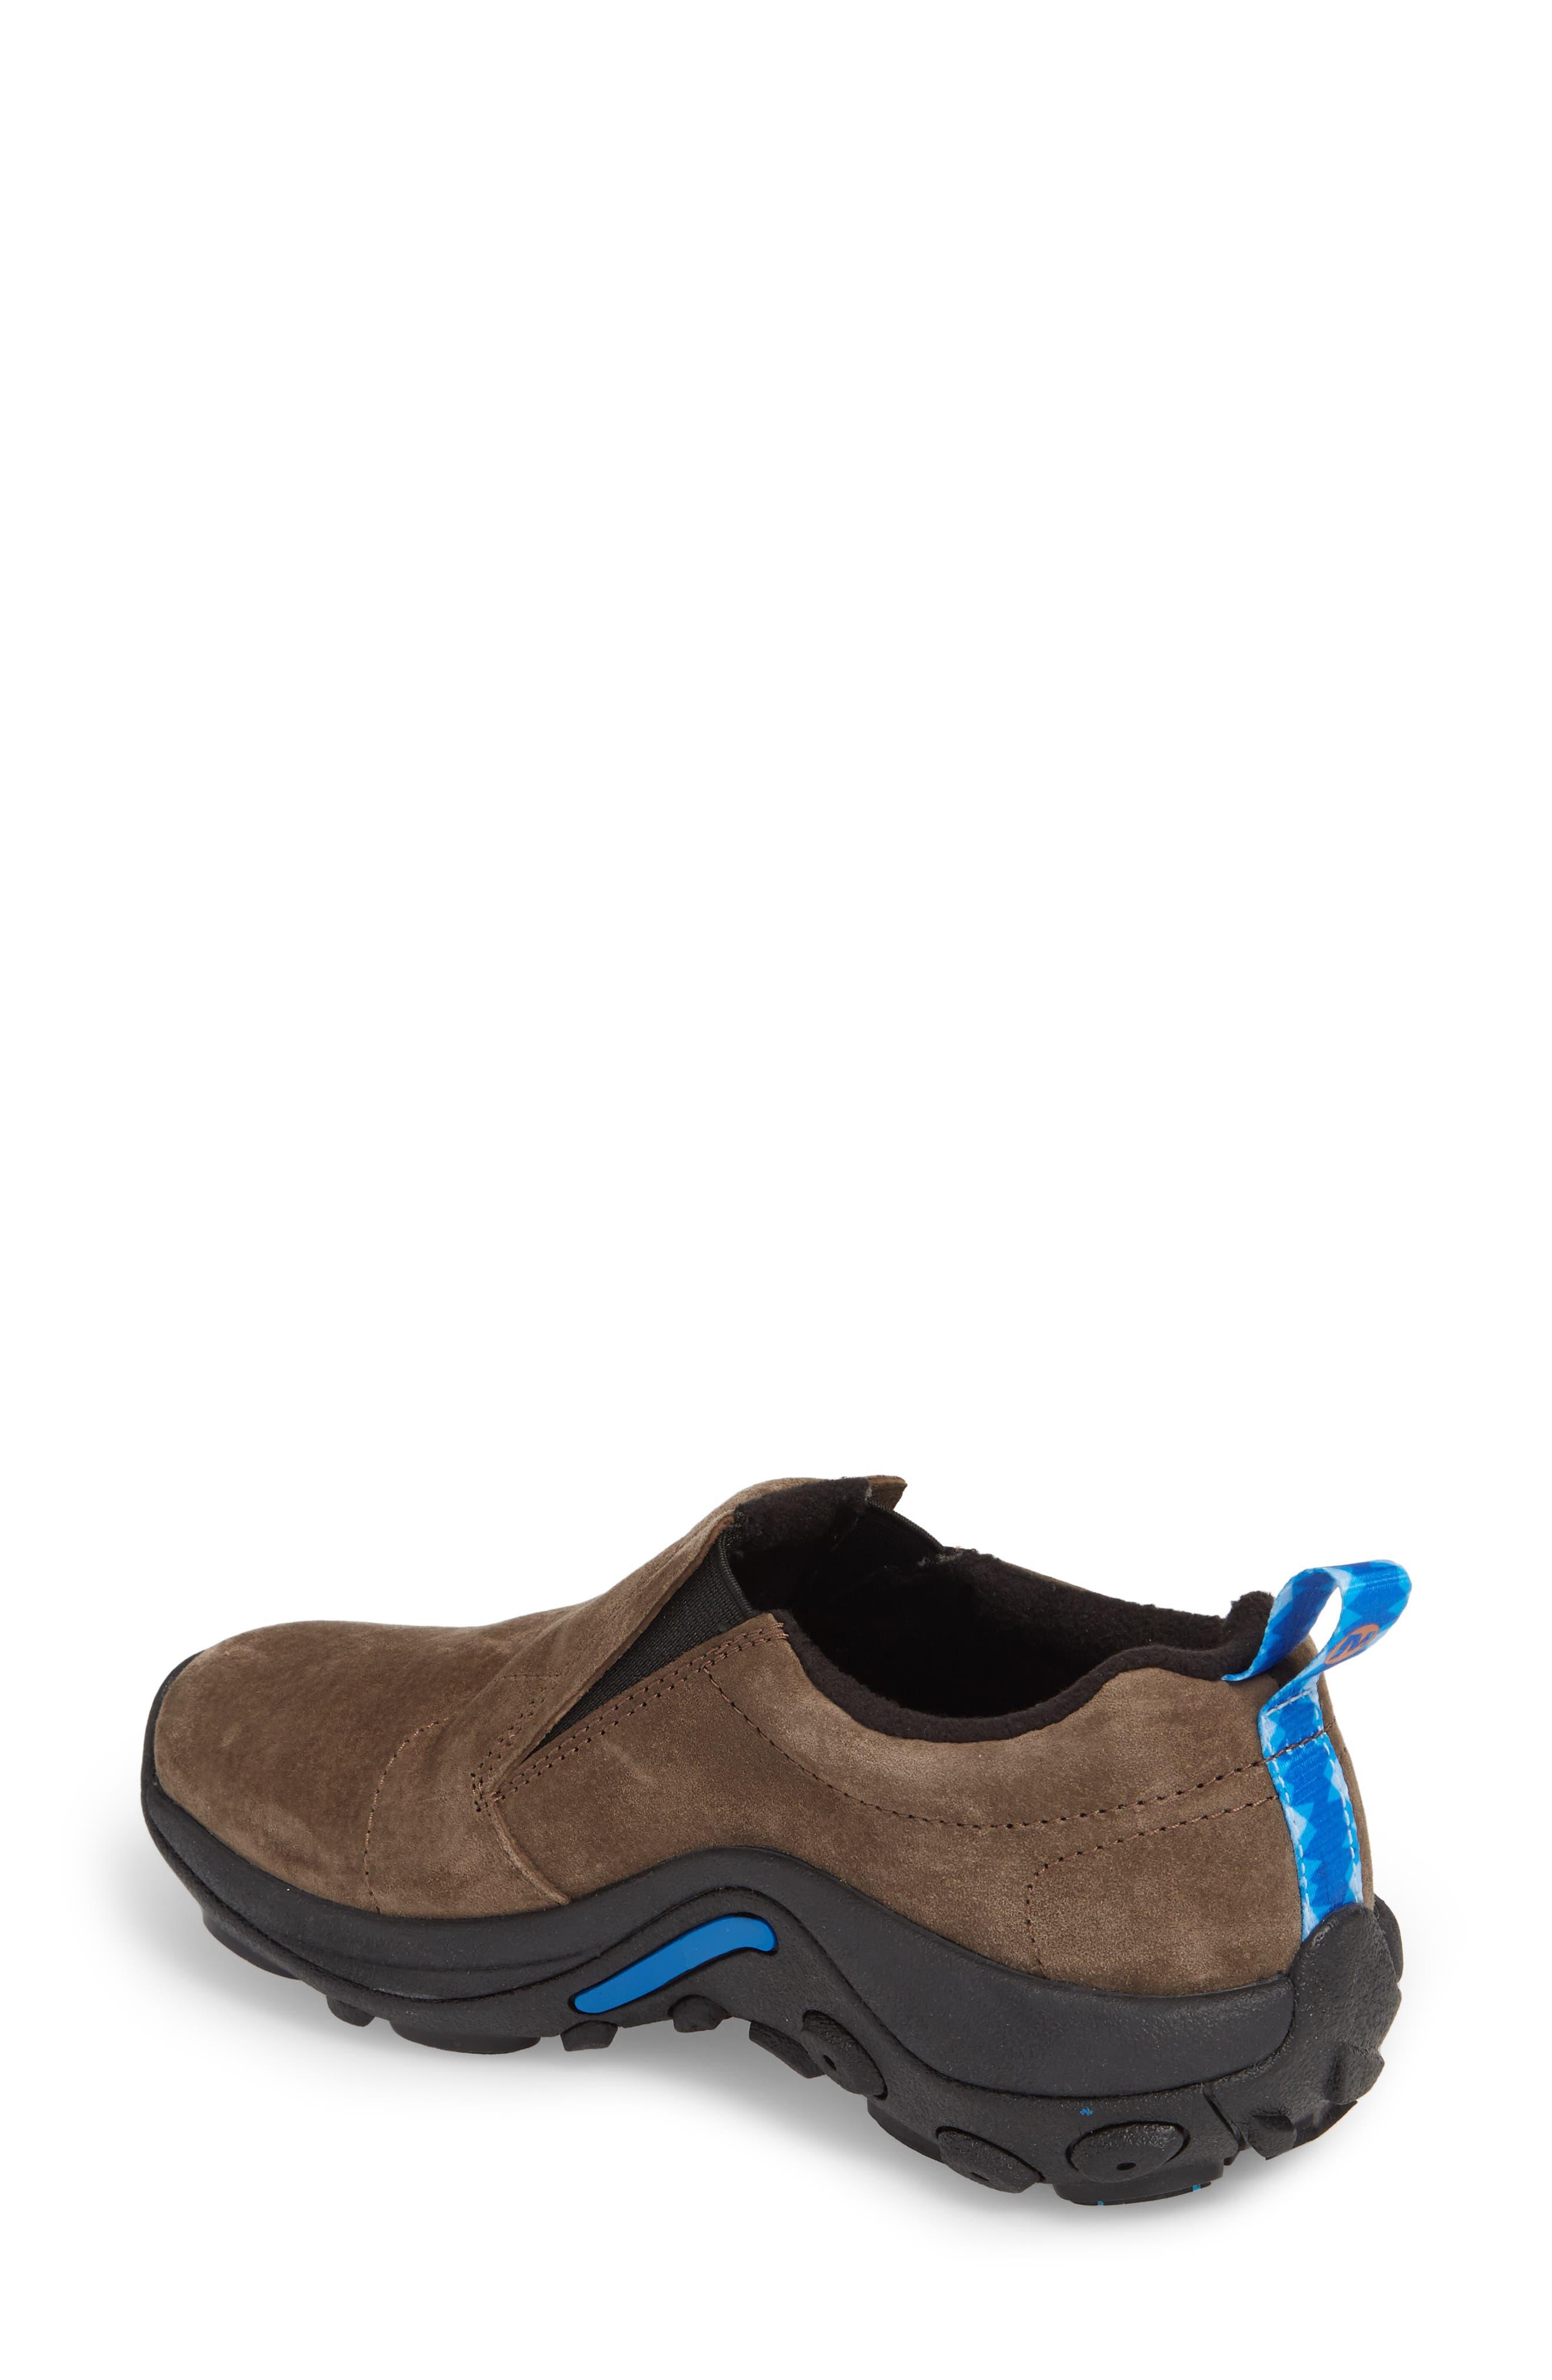 Jungle Moc Ice Waterproof Sneaker,                             Alternate thumbnail 2, color,                             Gun Smoke Leather